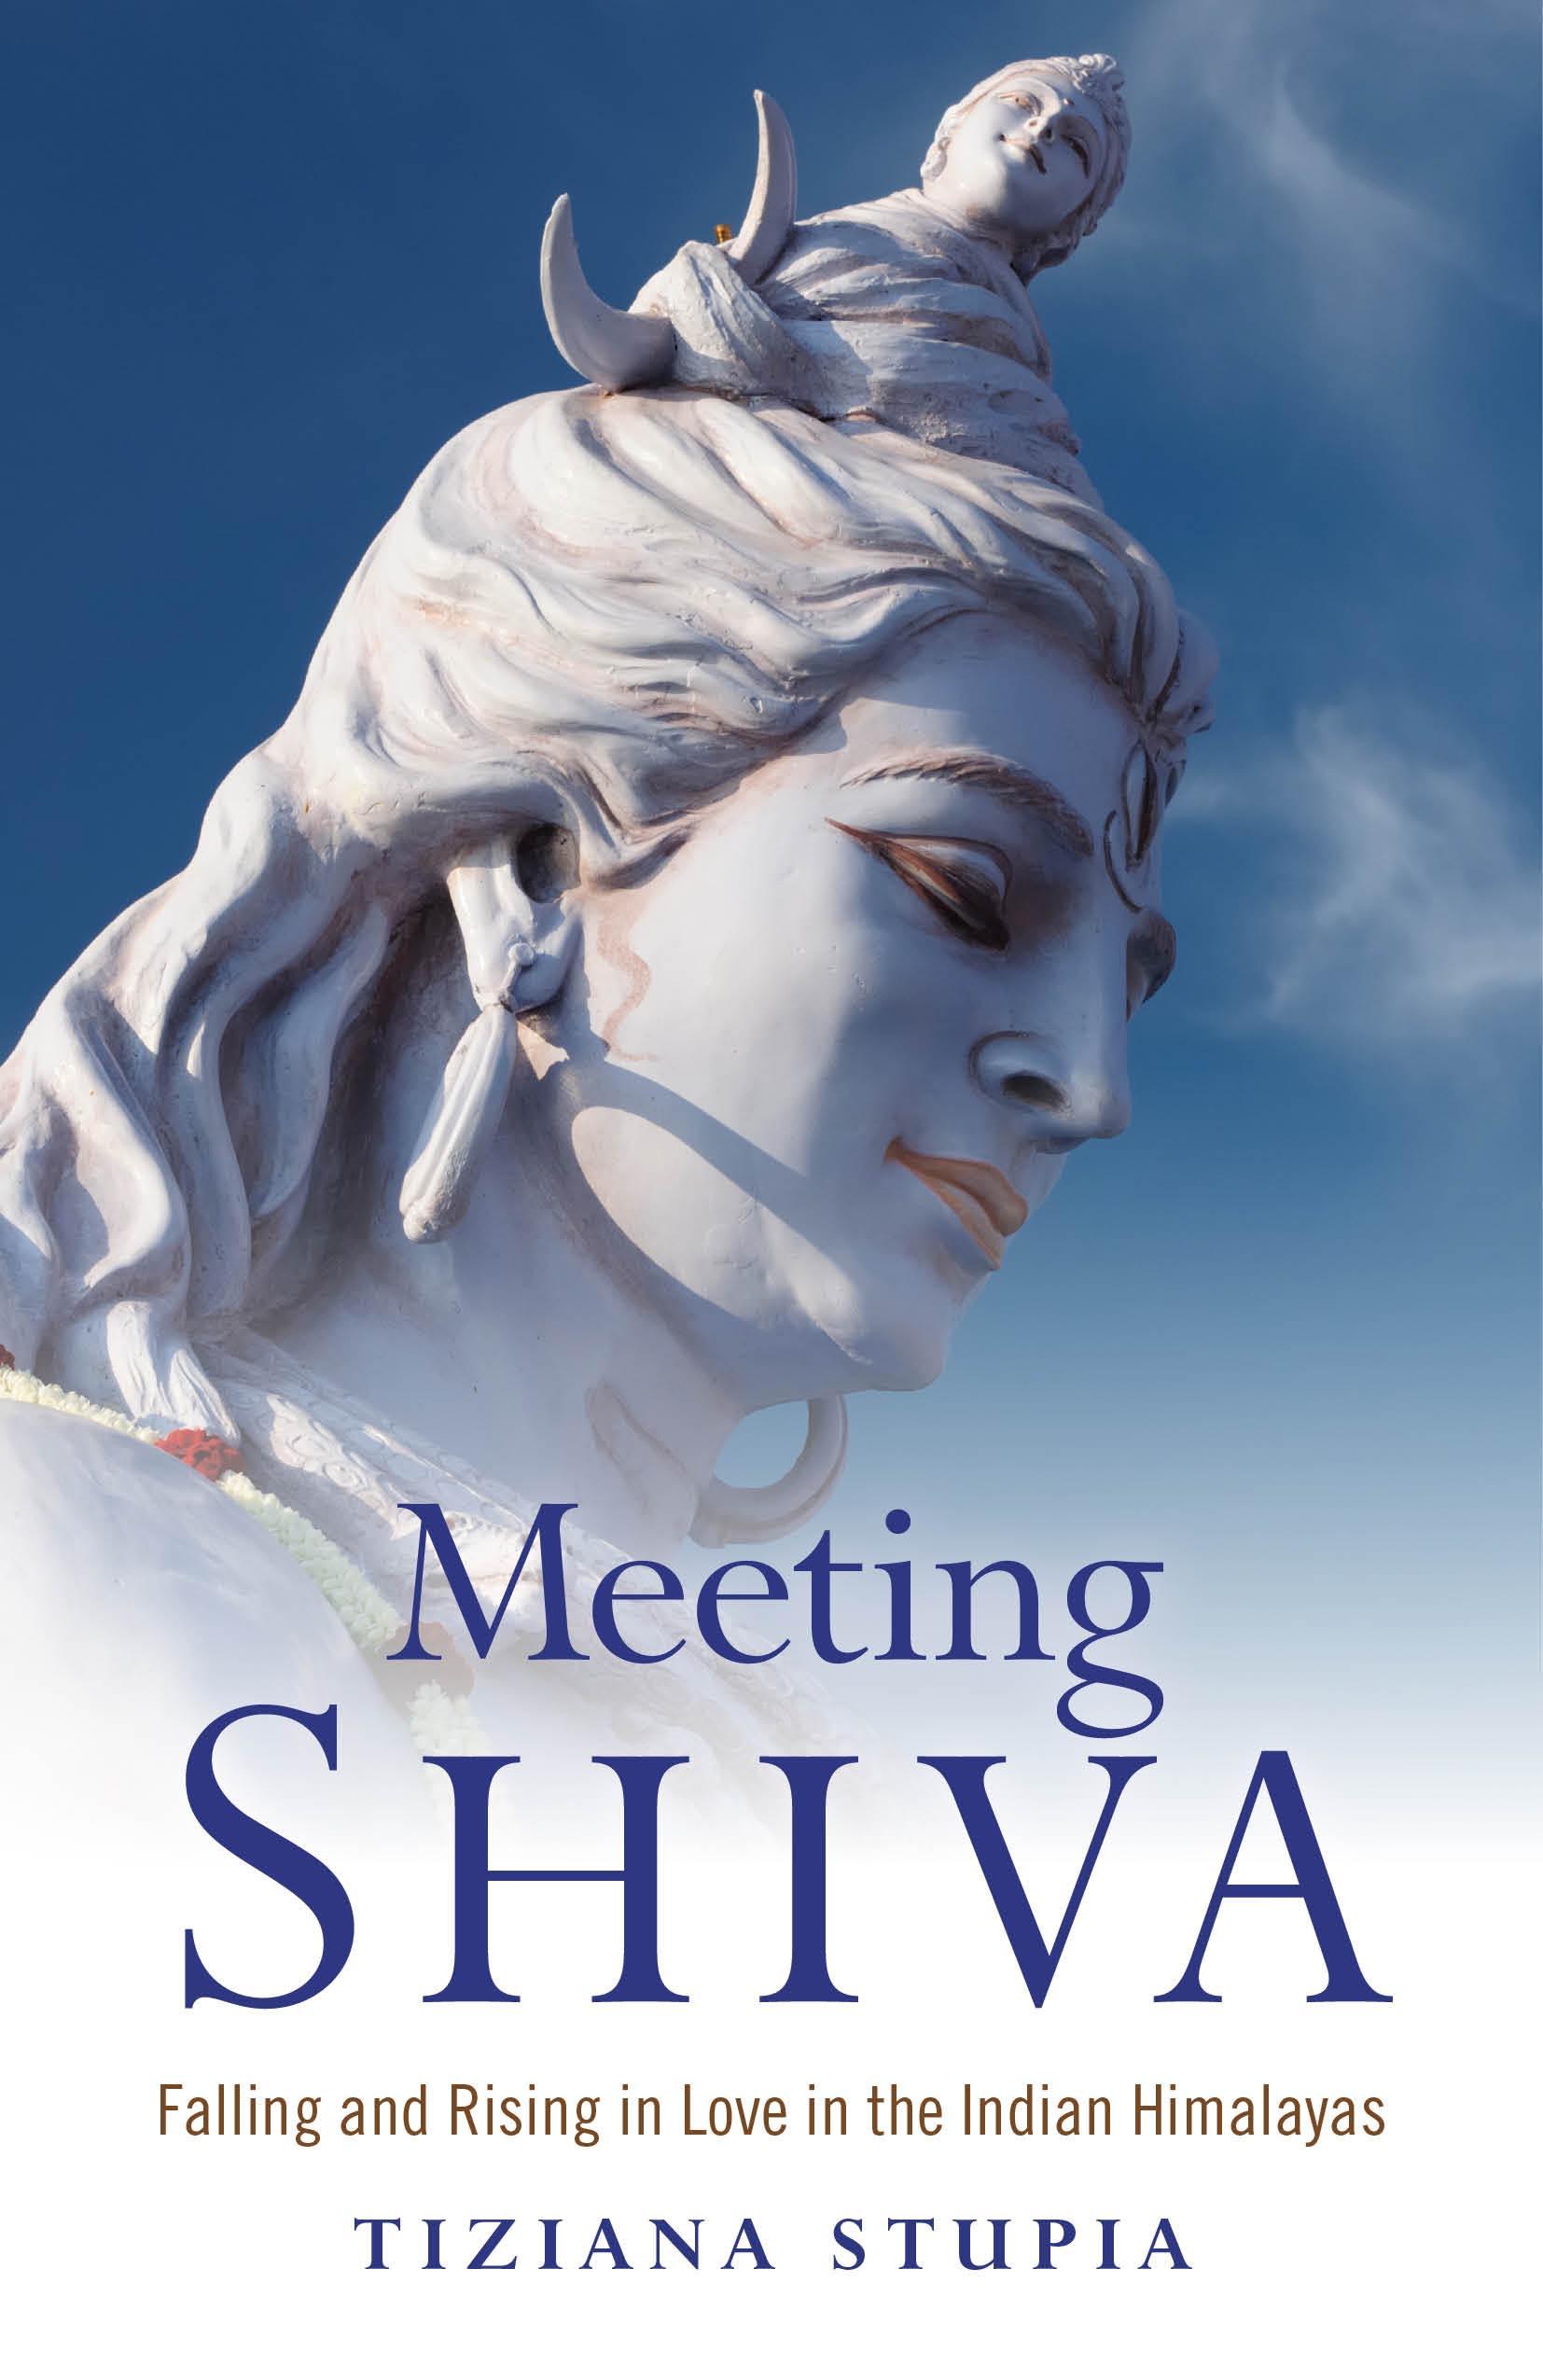 shiva and vishnu relationship tips